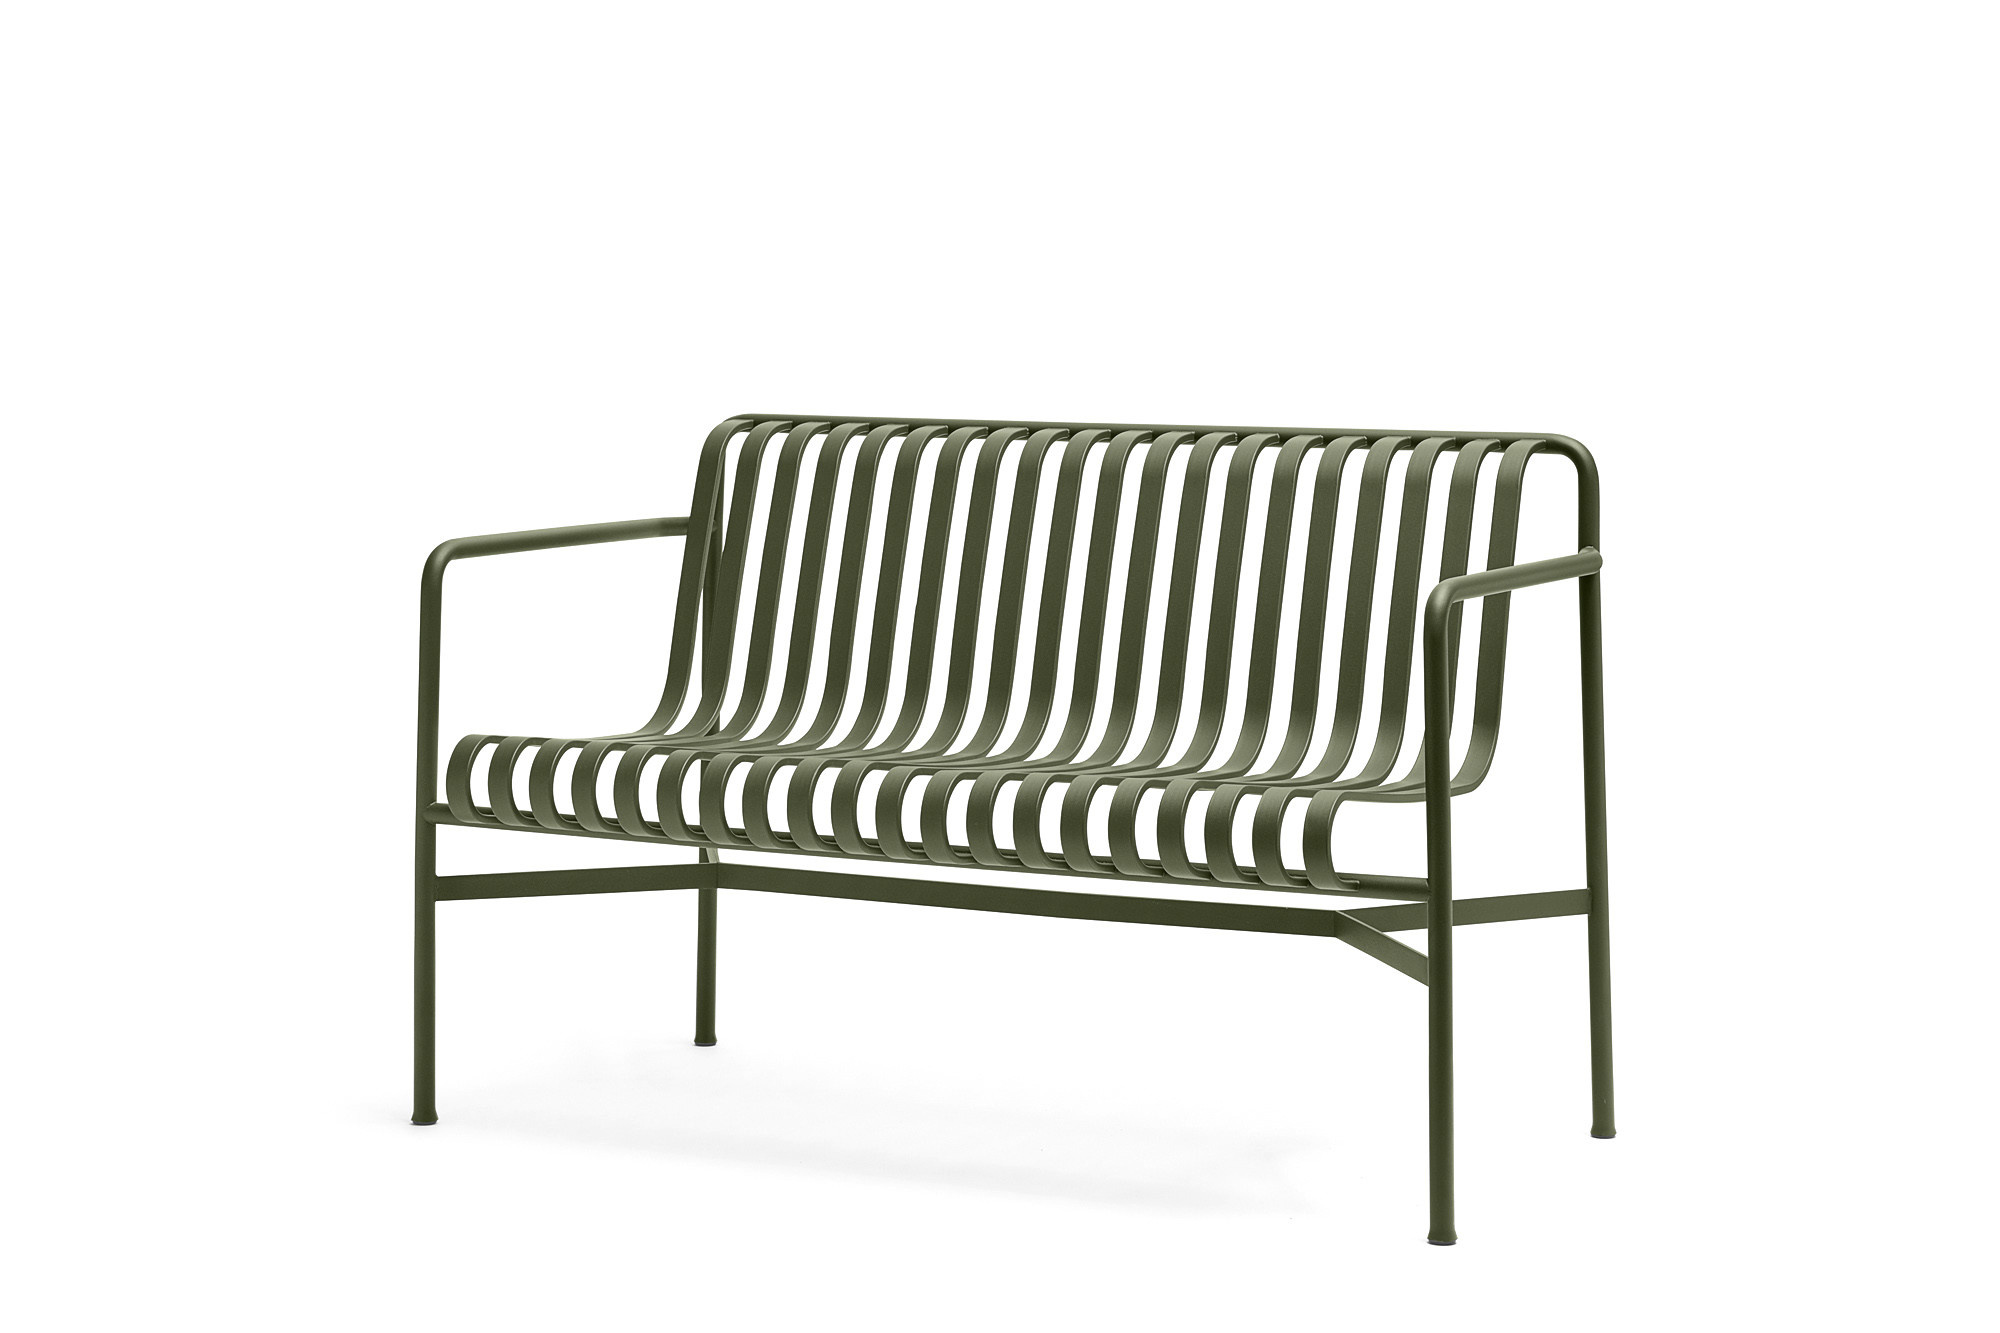 Palissade Dining bench-3